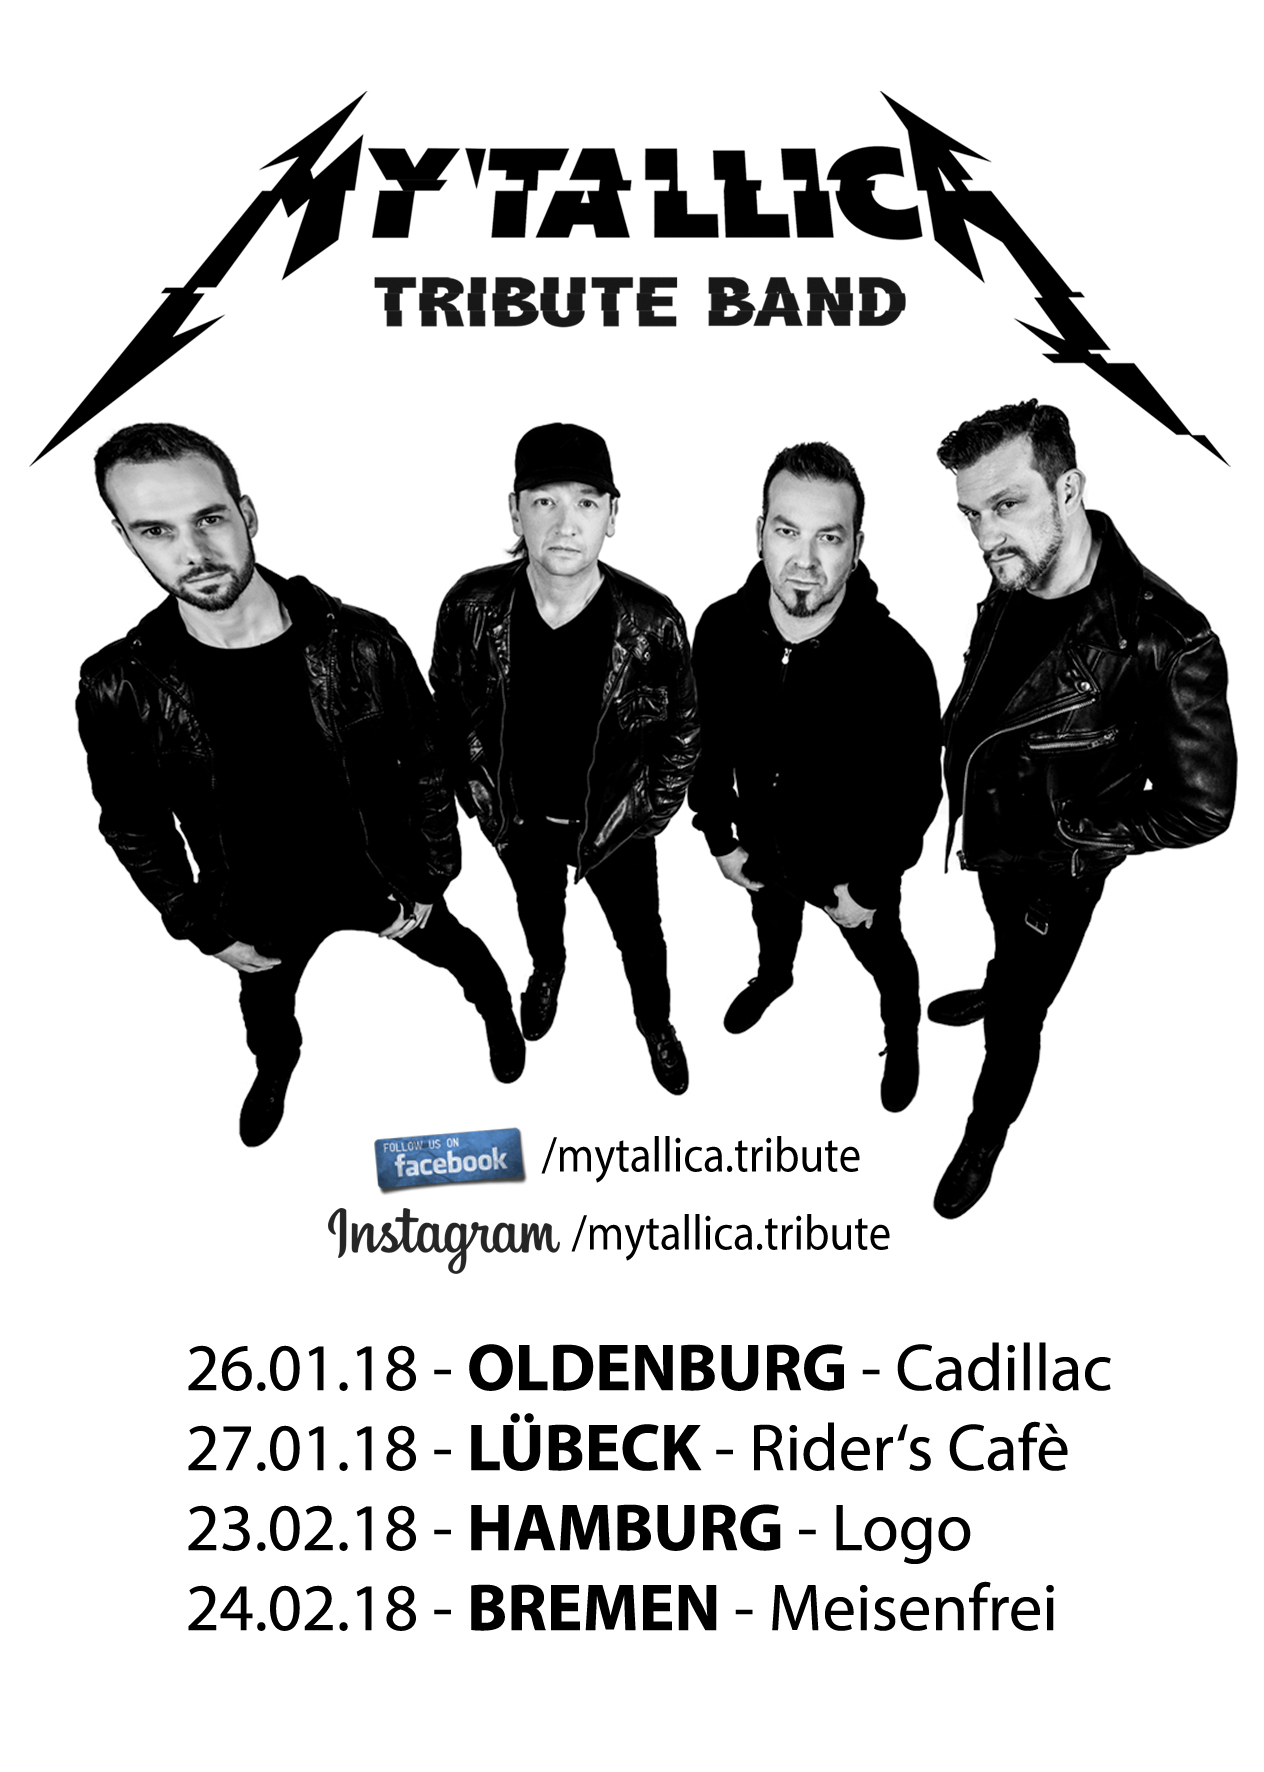 Metallica-Cover-MYTALLICA-Tribute-Band-Shows-2018-Flyer-Hamburg-Bremen-Oldenburg-Lübeck